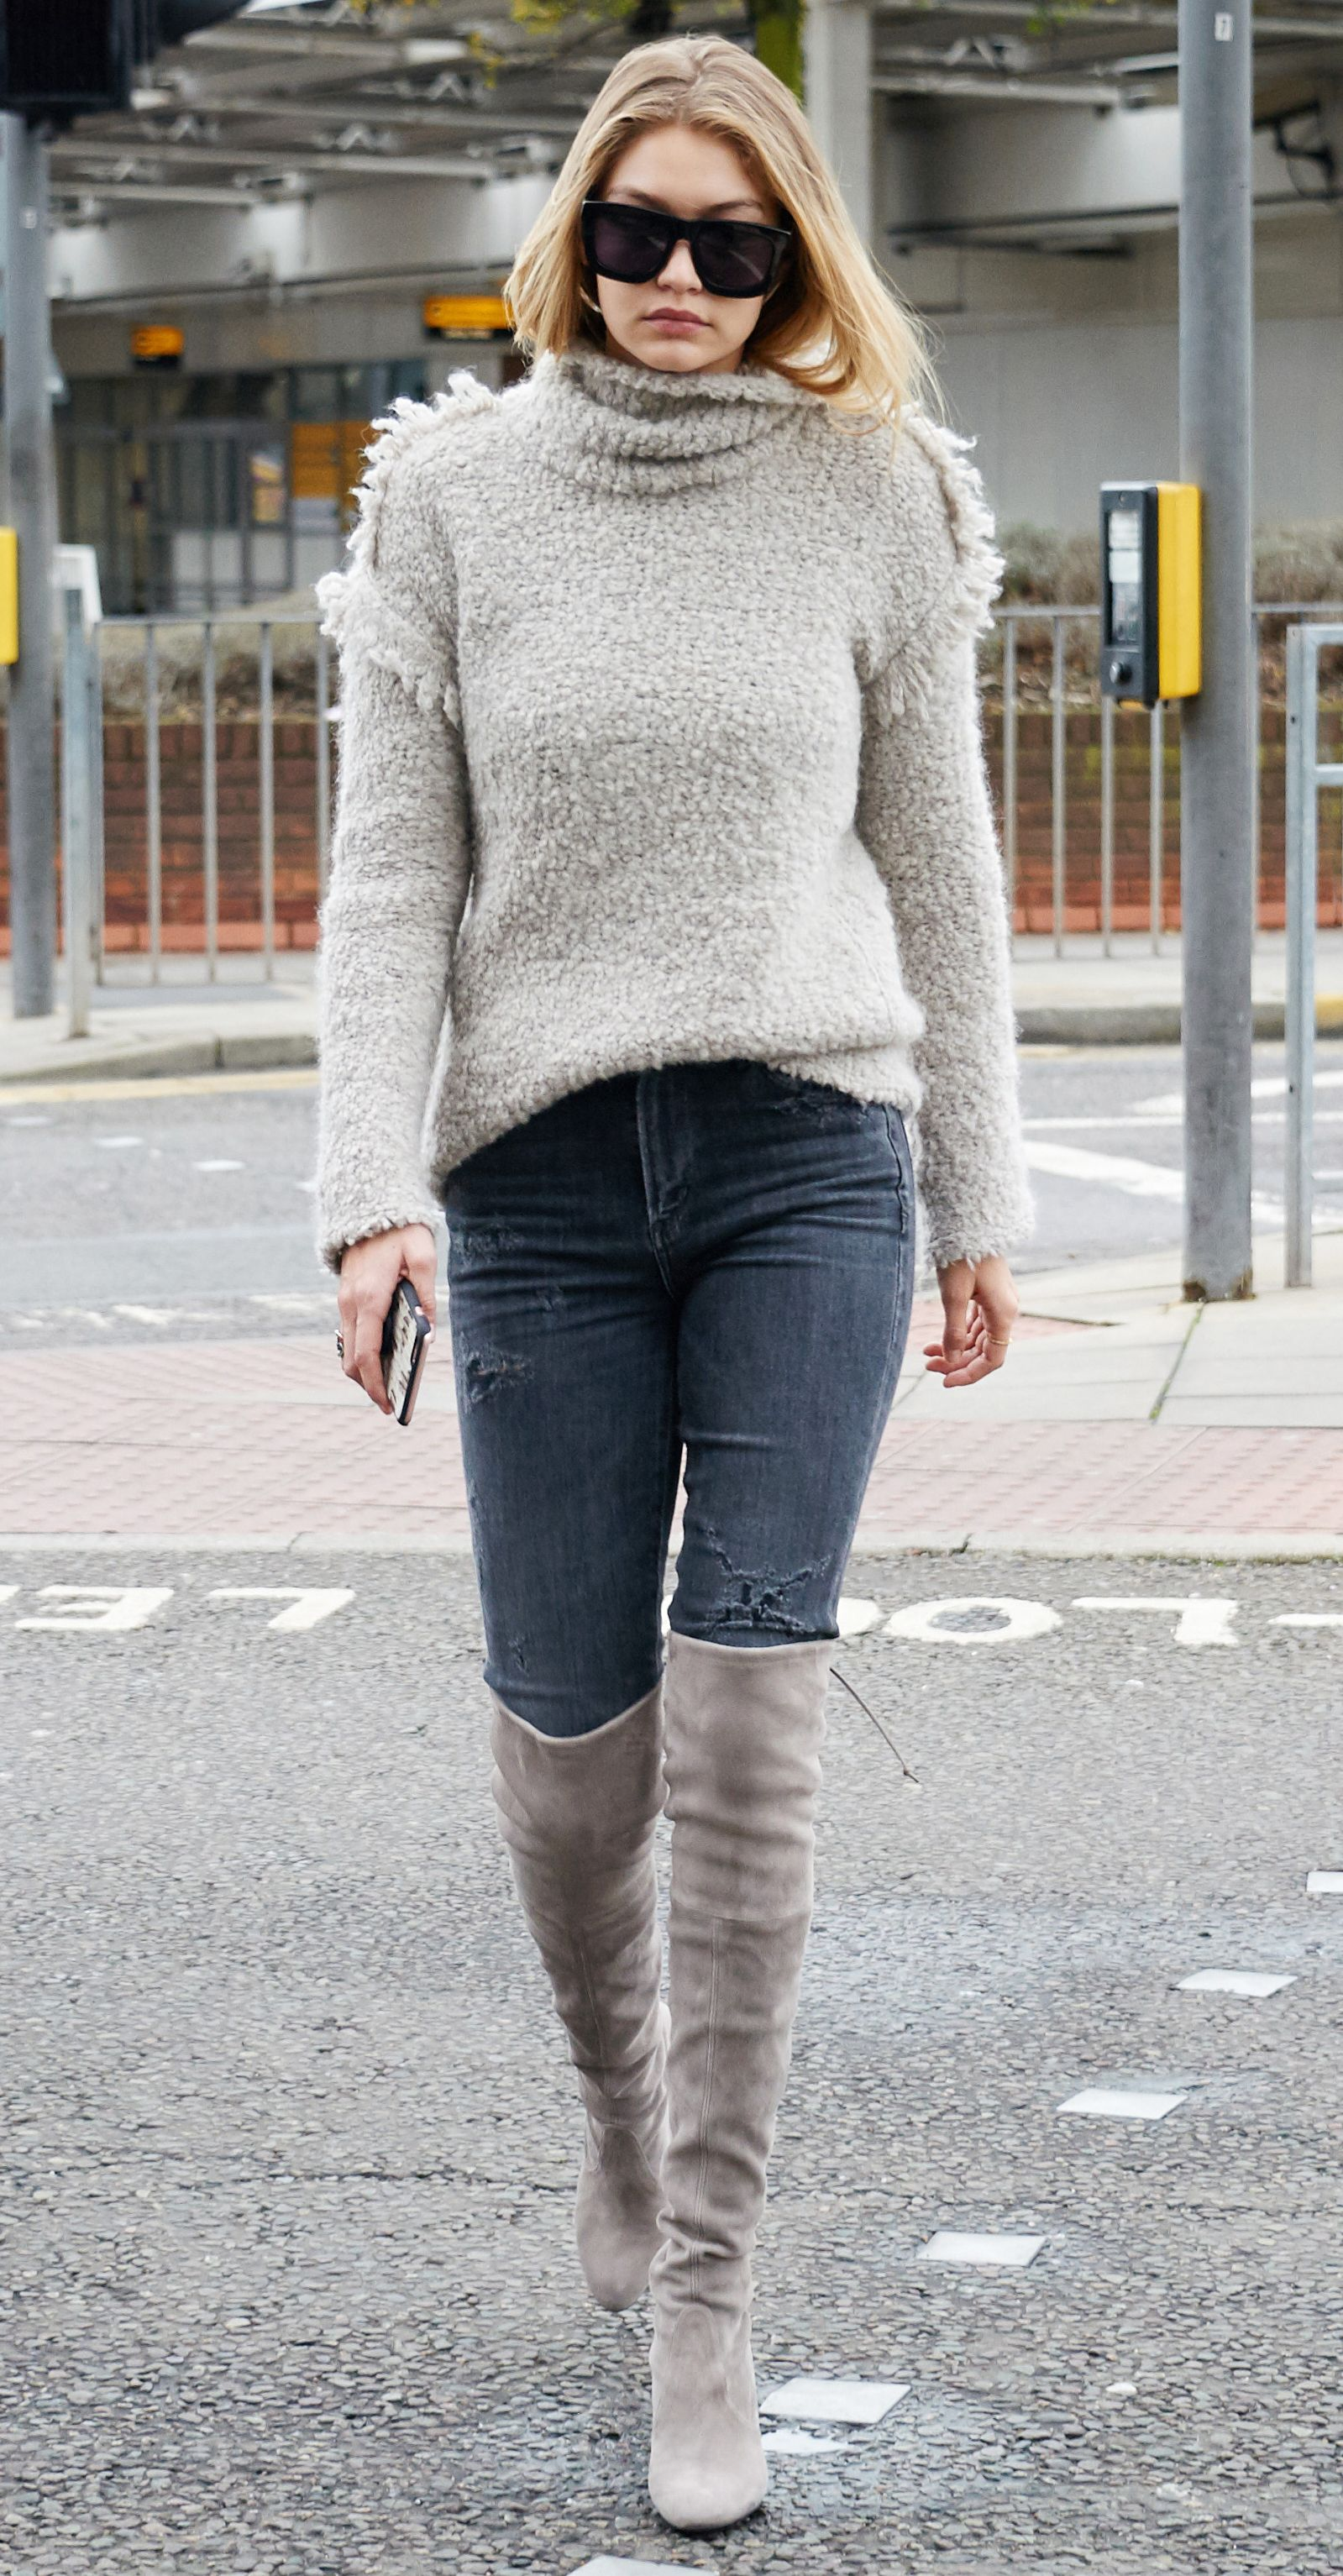 7ce2162b503 Gigi Hadid in a cozy gray fringed turtleneck